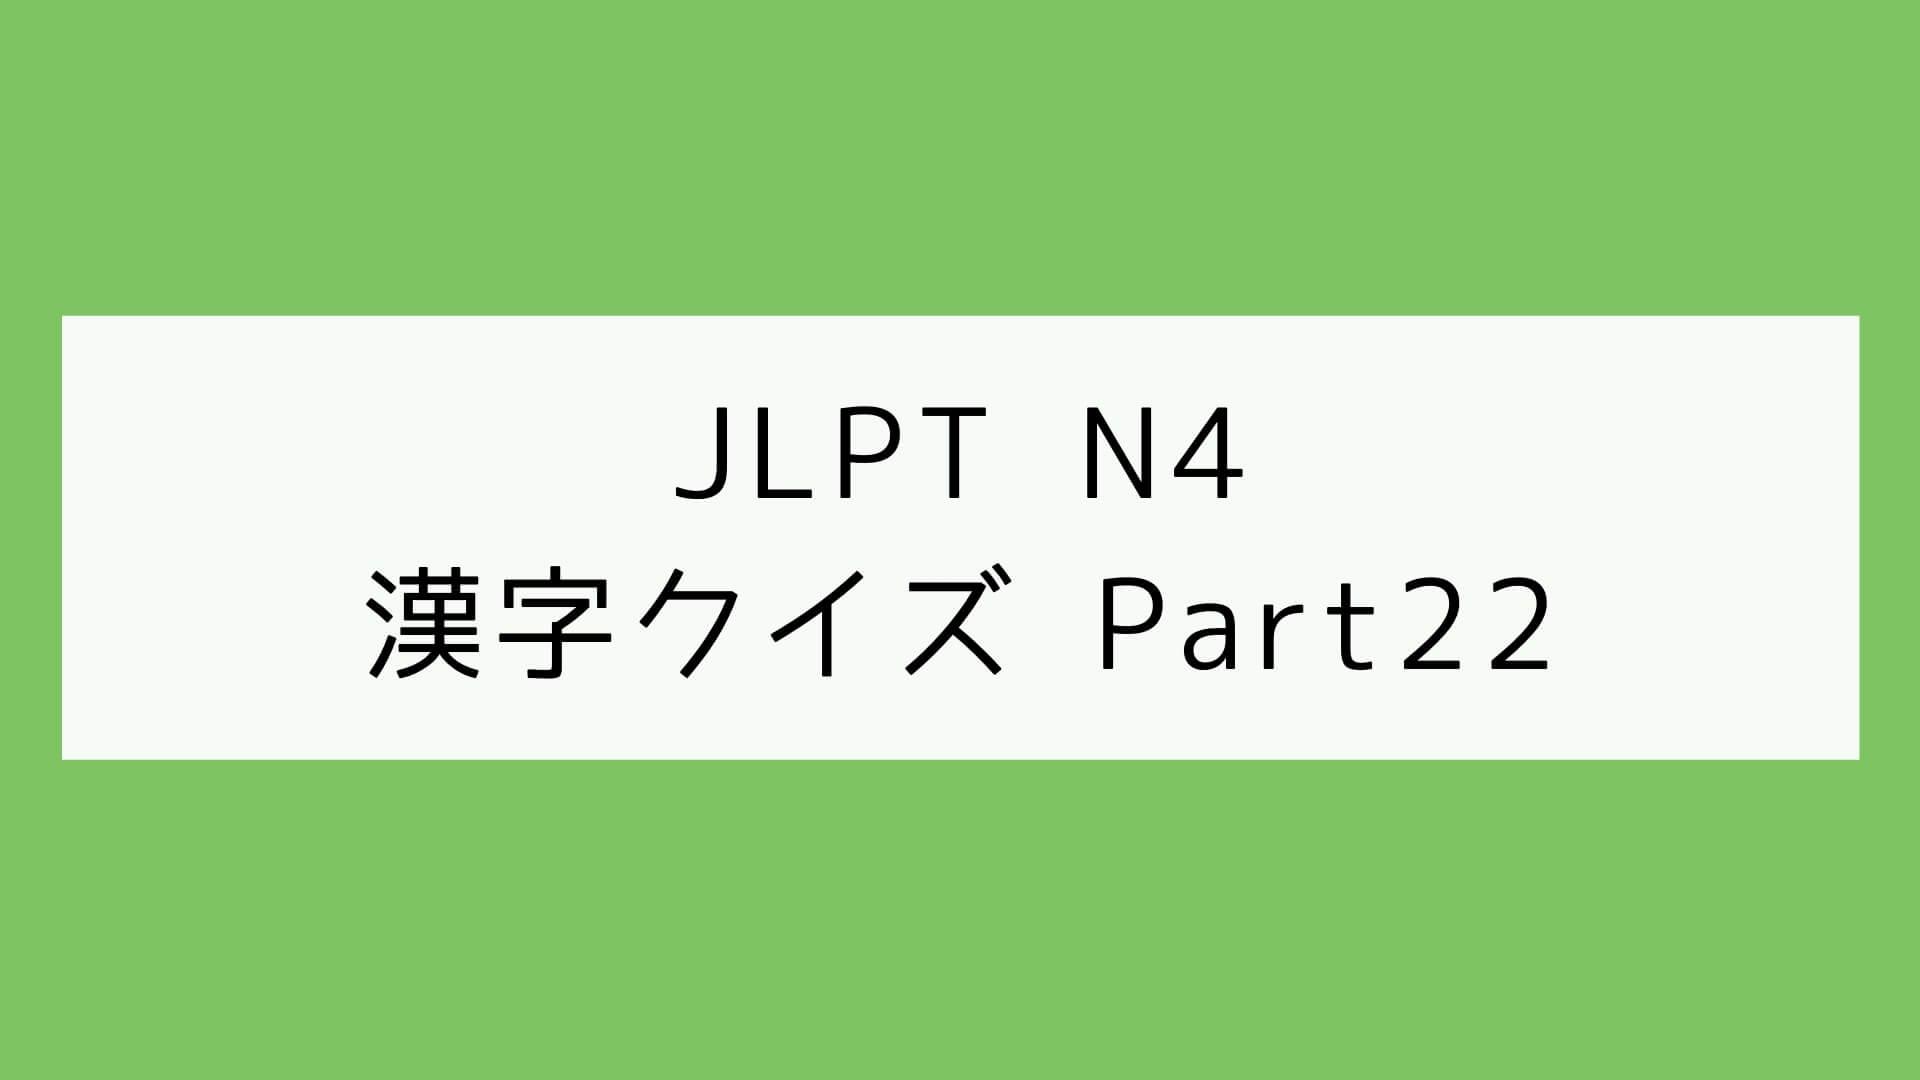 【JLPT N4】漢字クイズ Part22